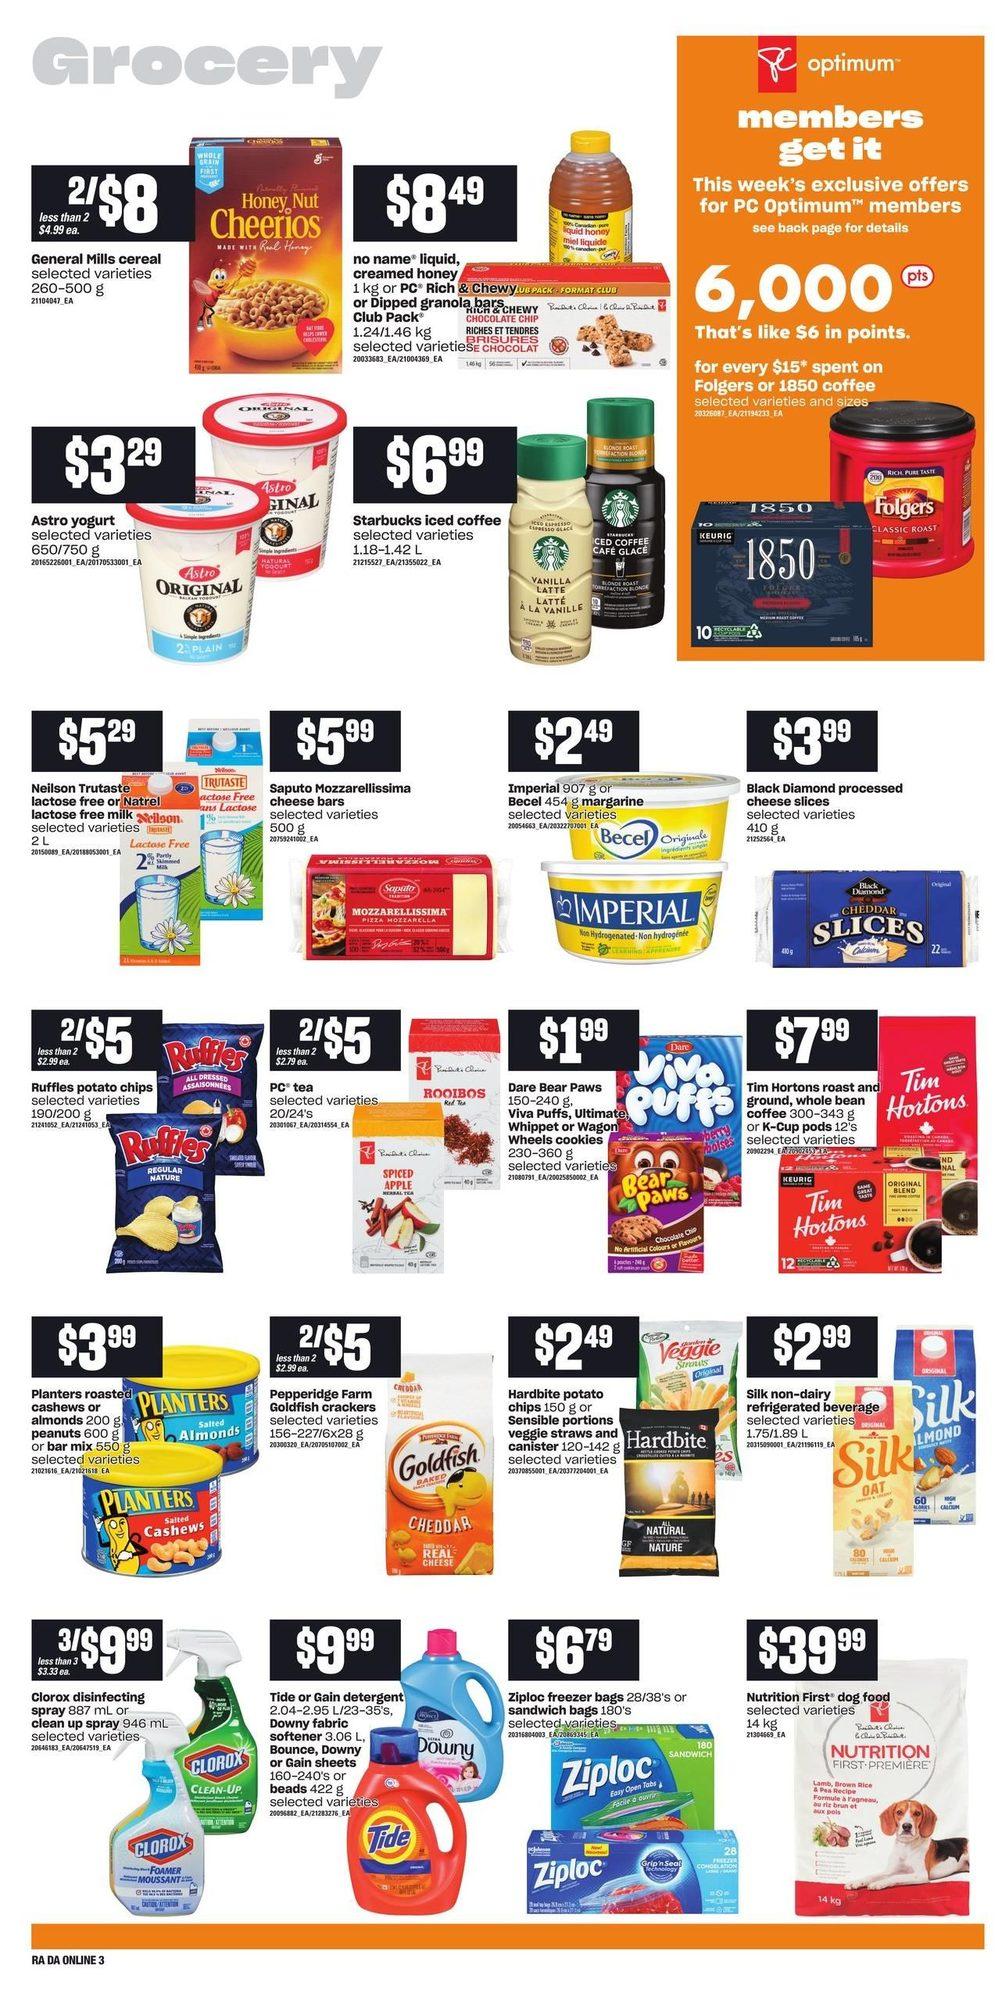 Atlantic Superstore - Weekly Flyer Specials - Page 7